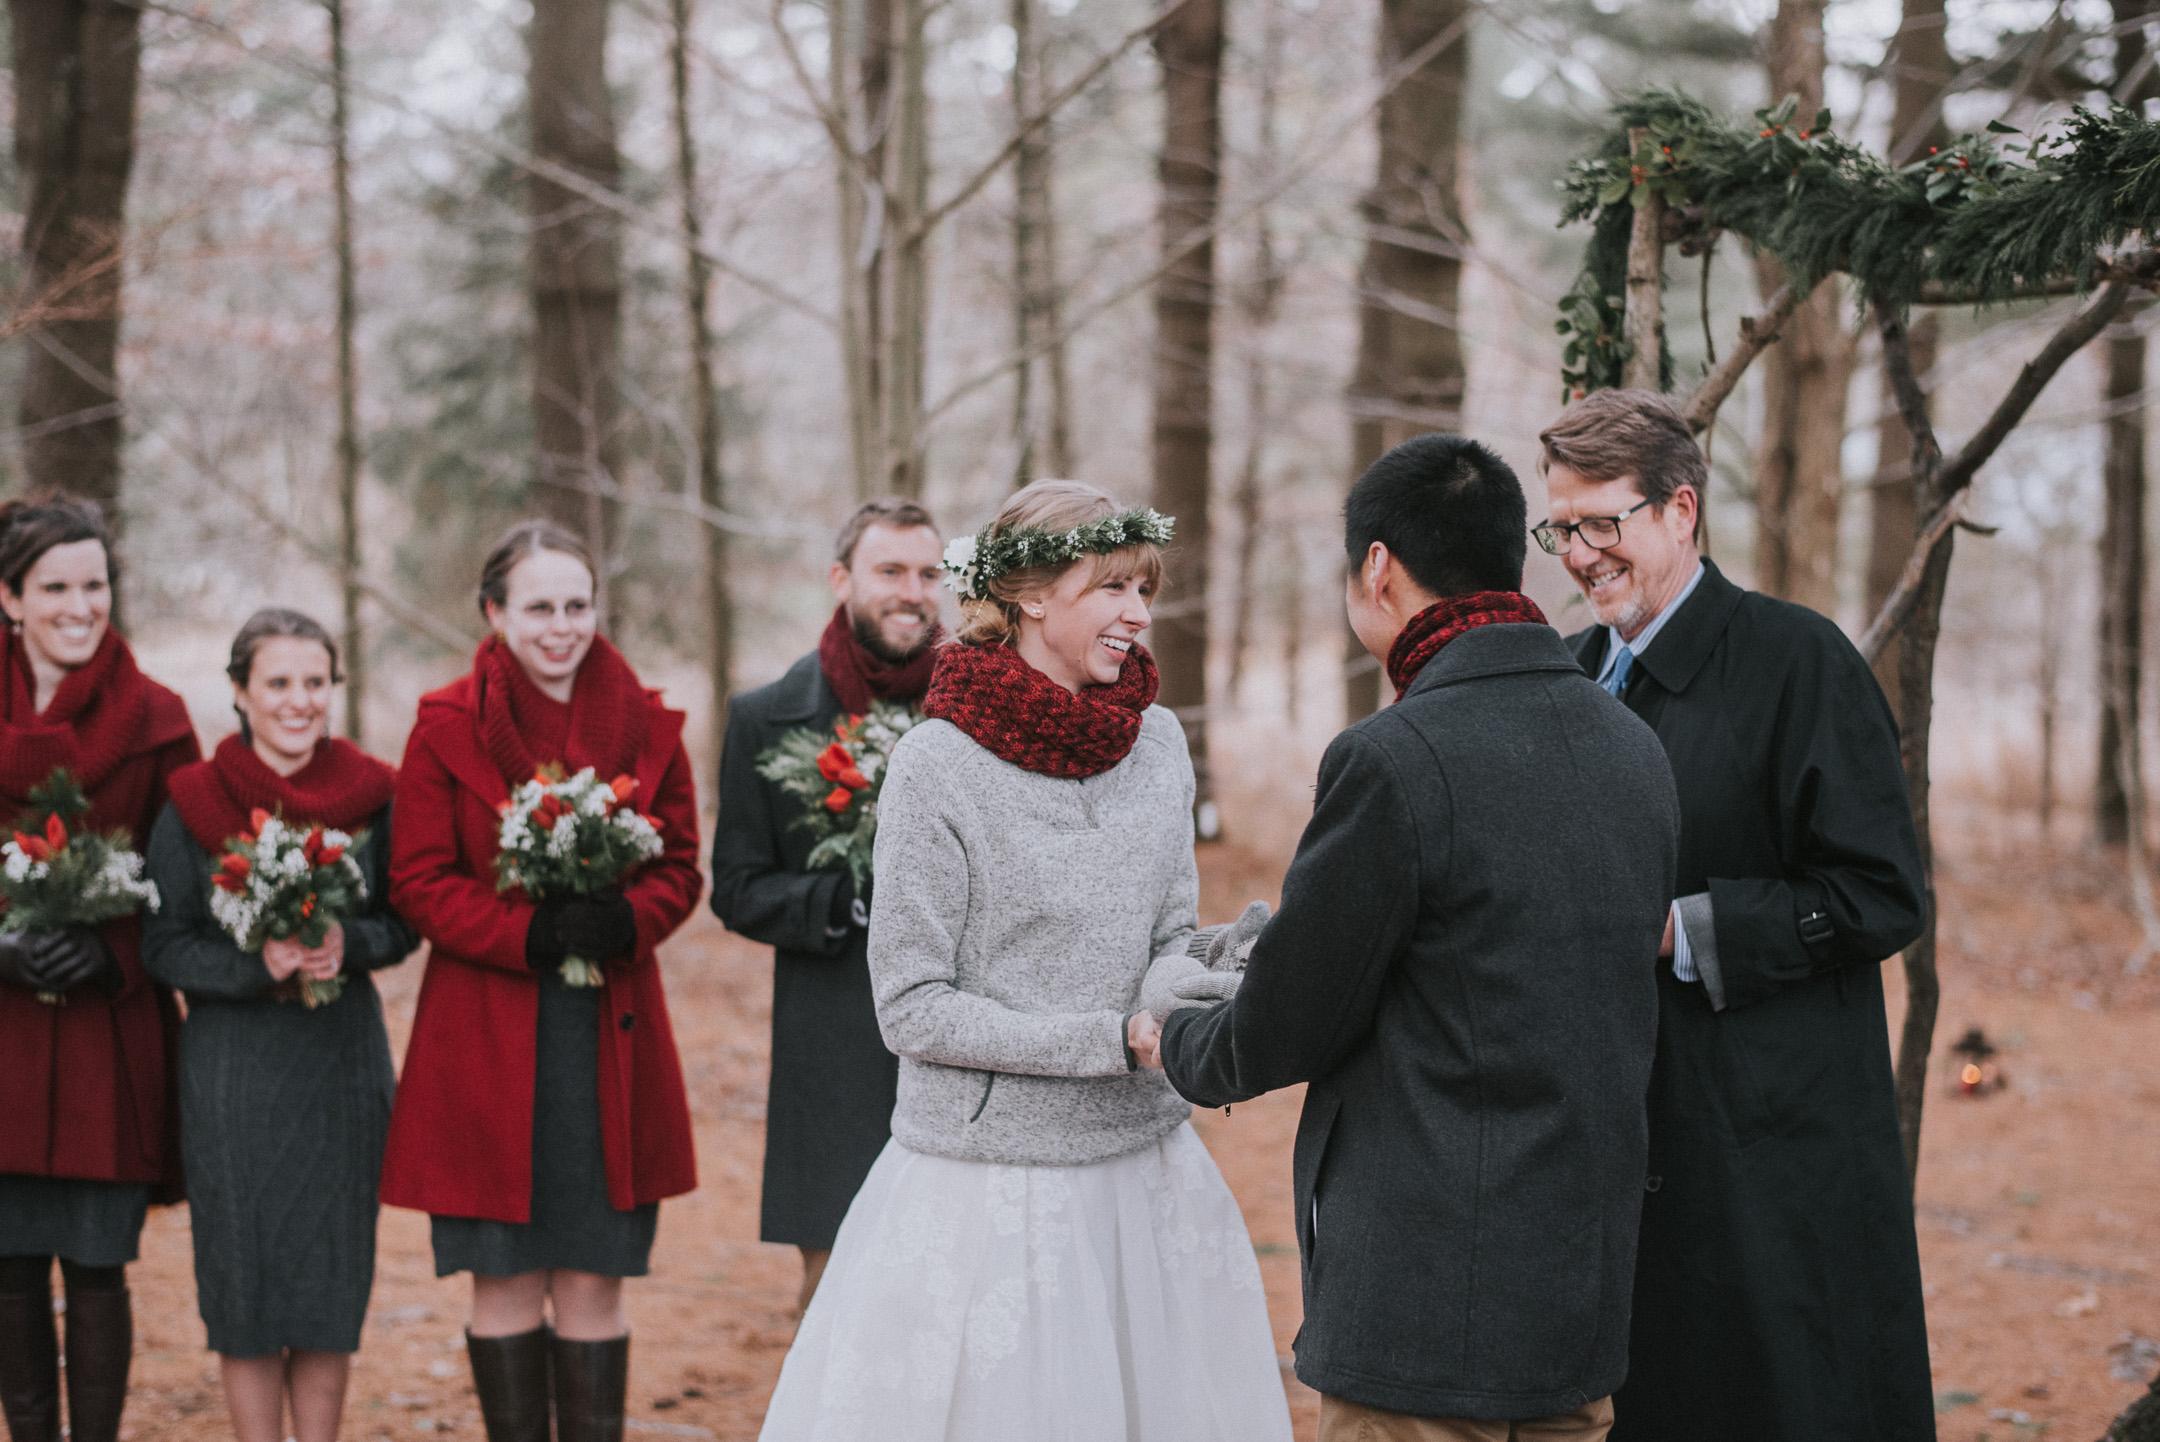 thurmont wedding photographer (19 of 38).jpg